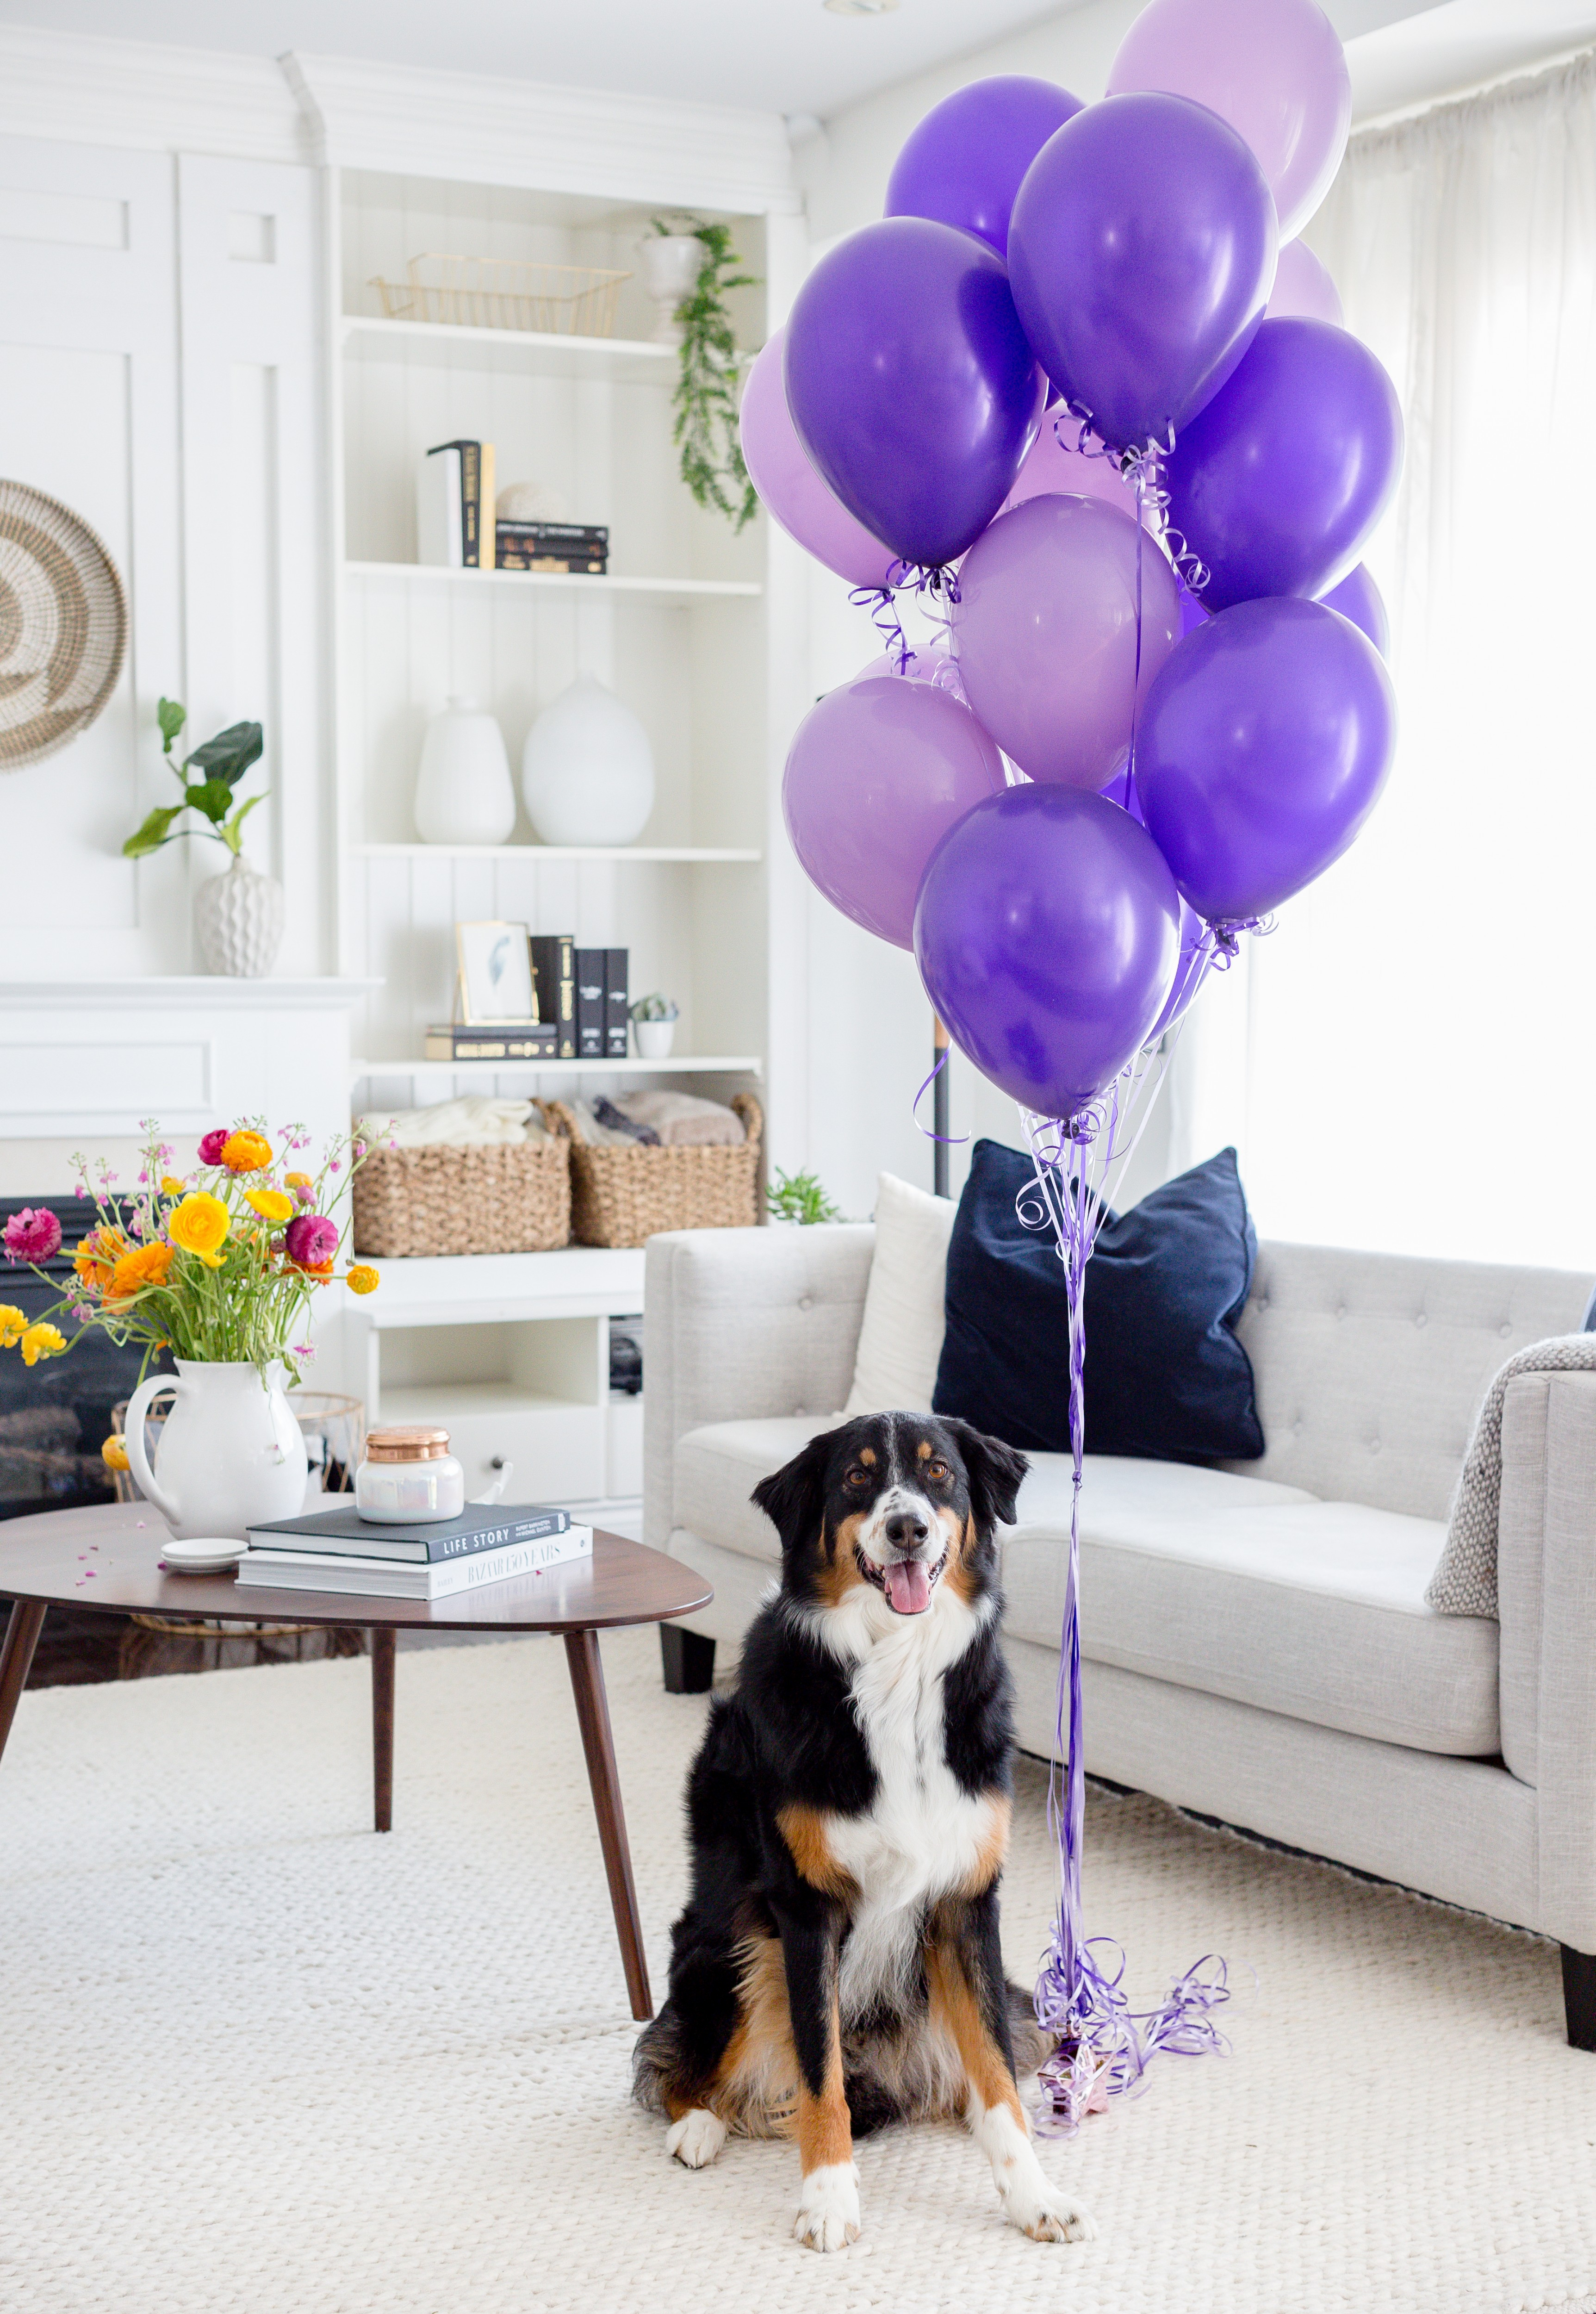 brodypurpleballoons